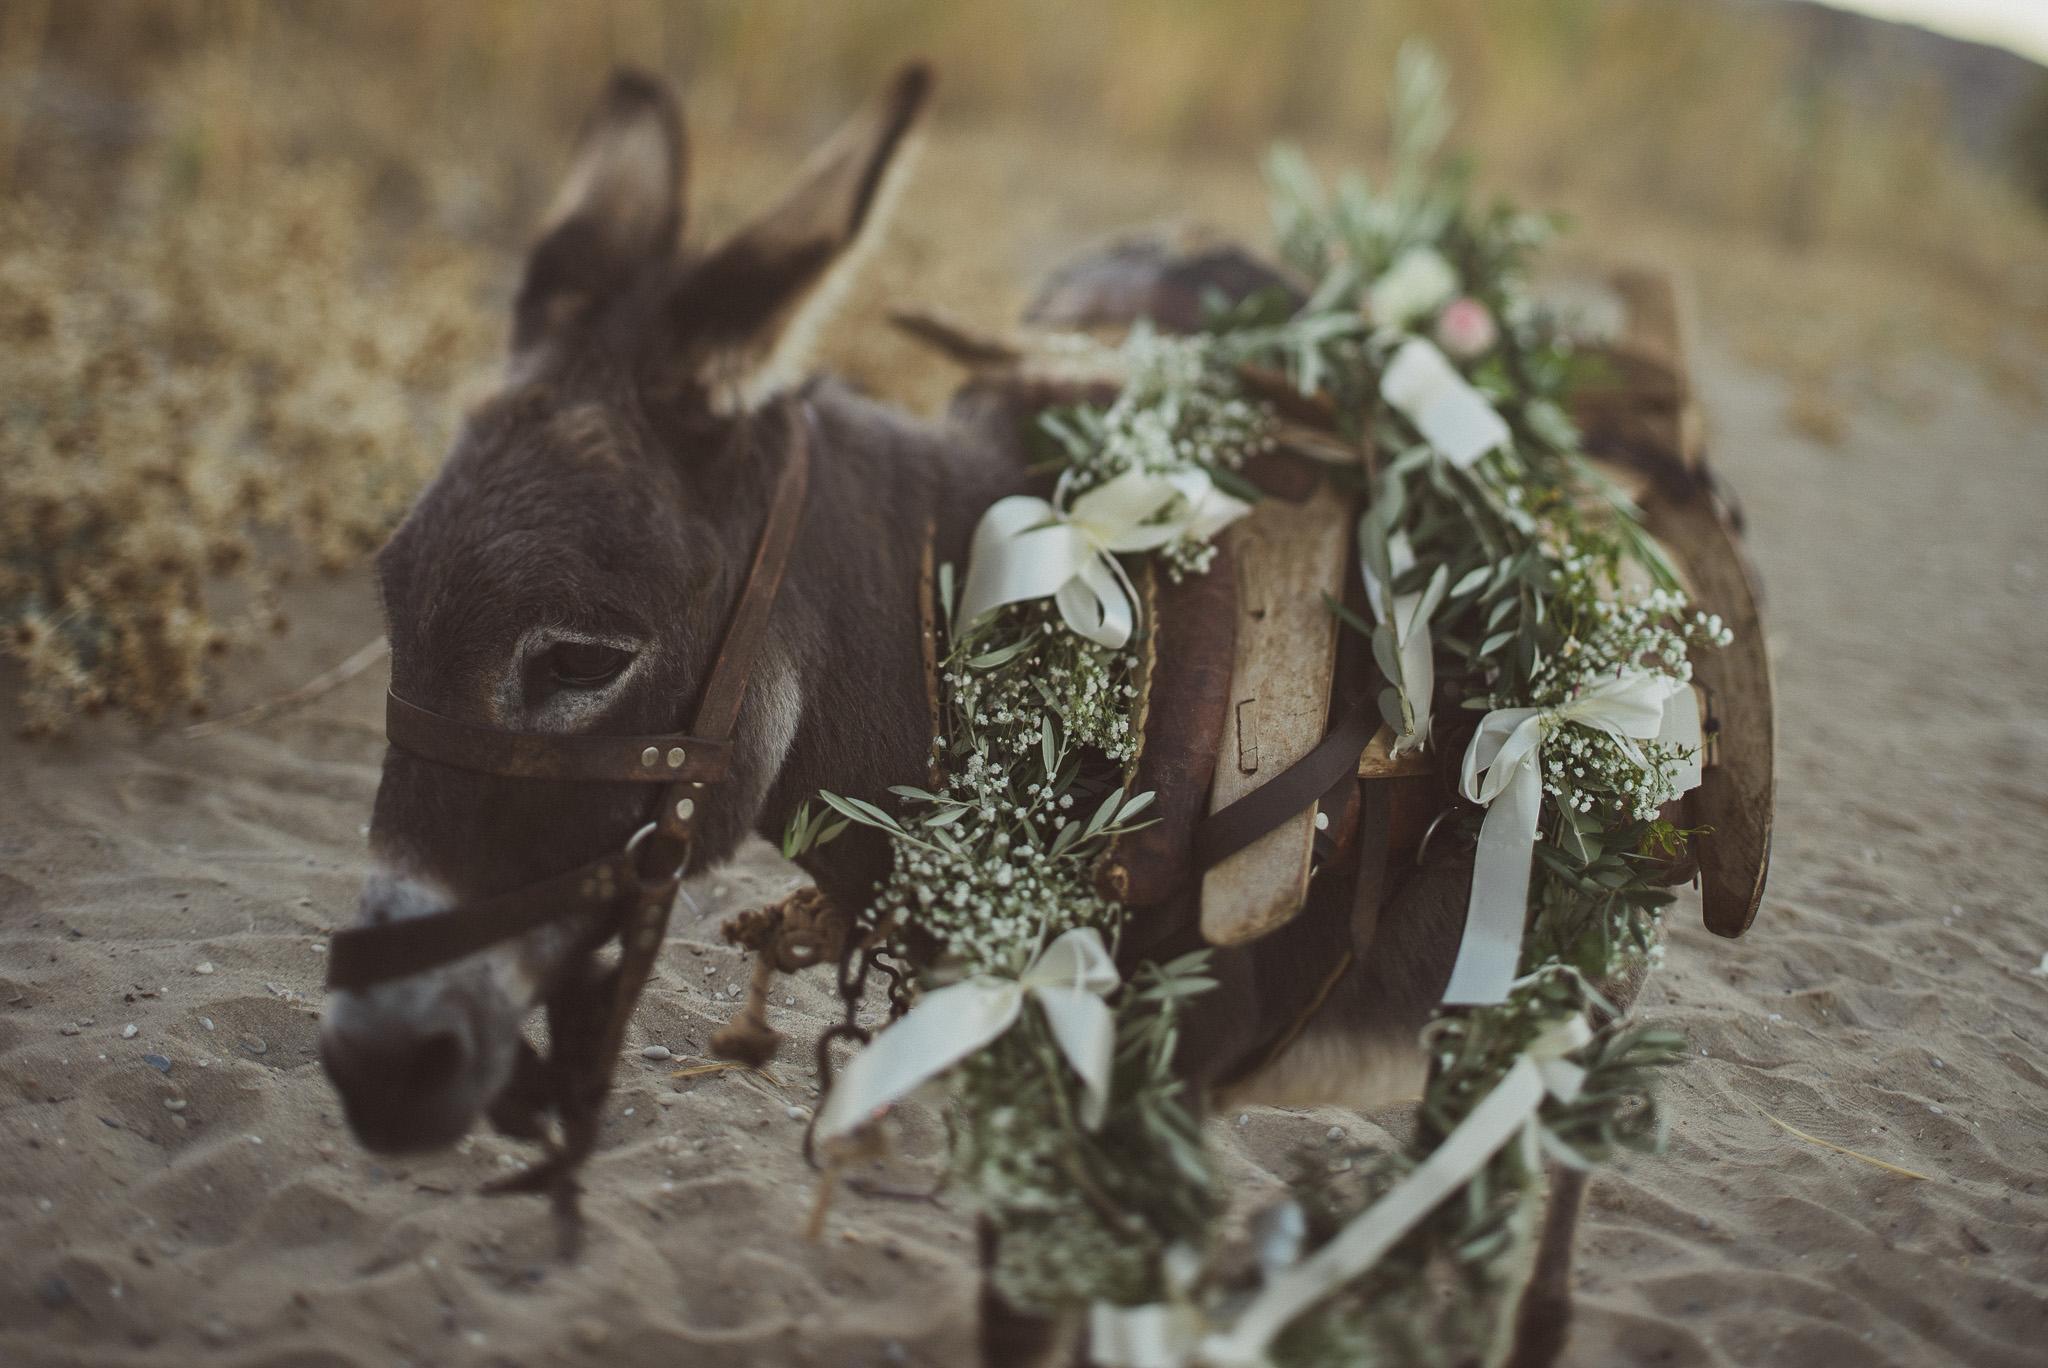 Donkey at wedding venue